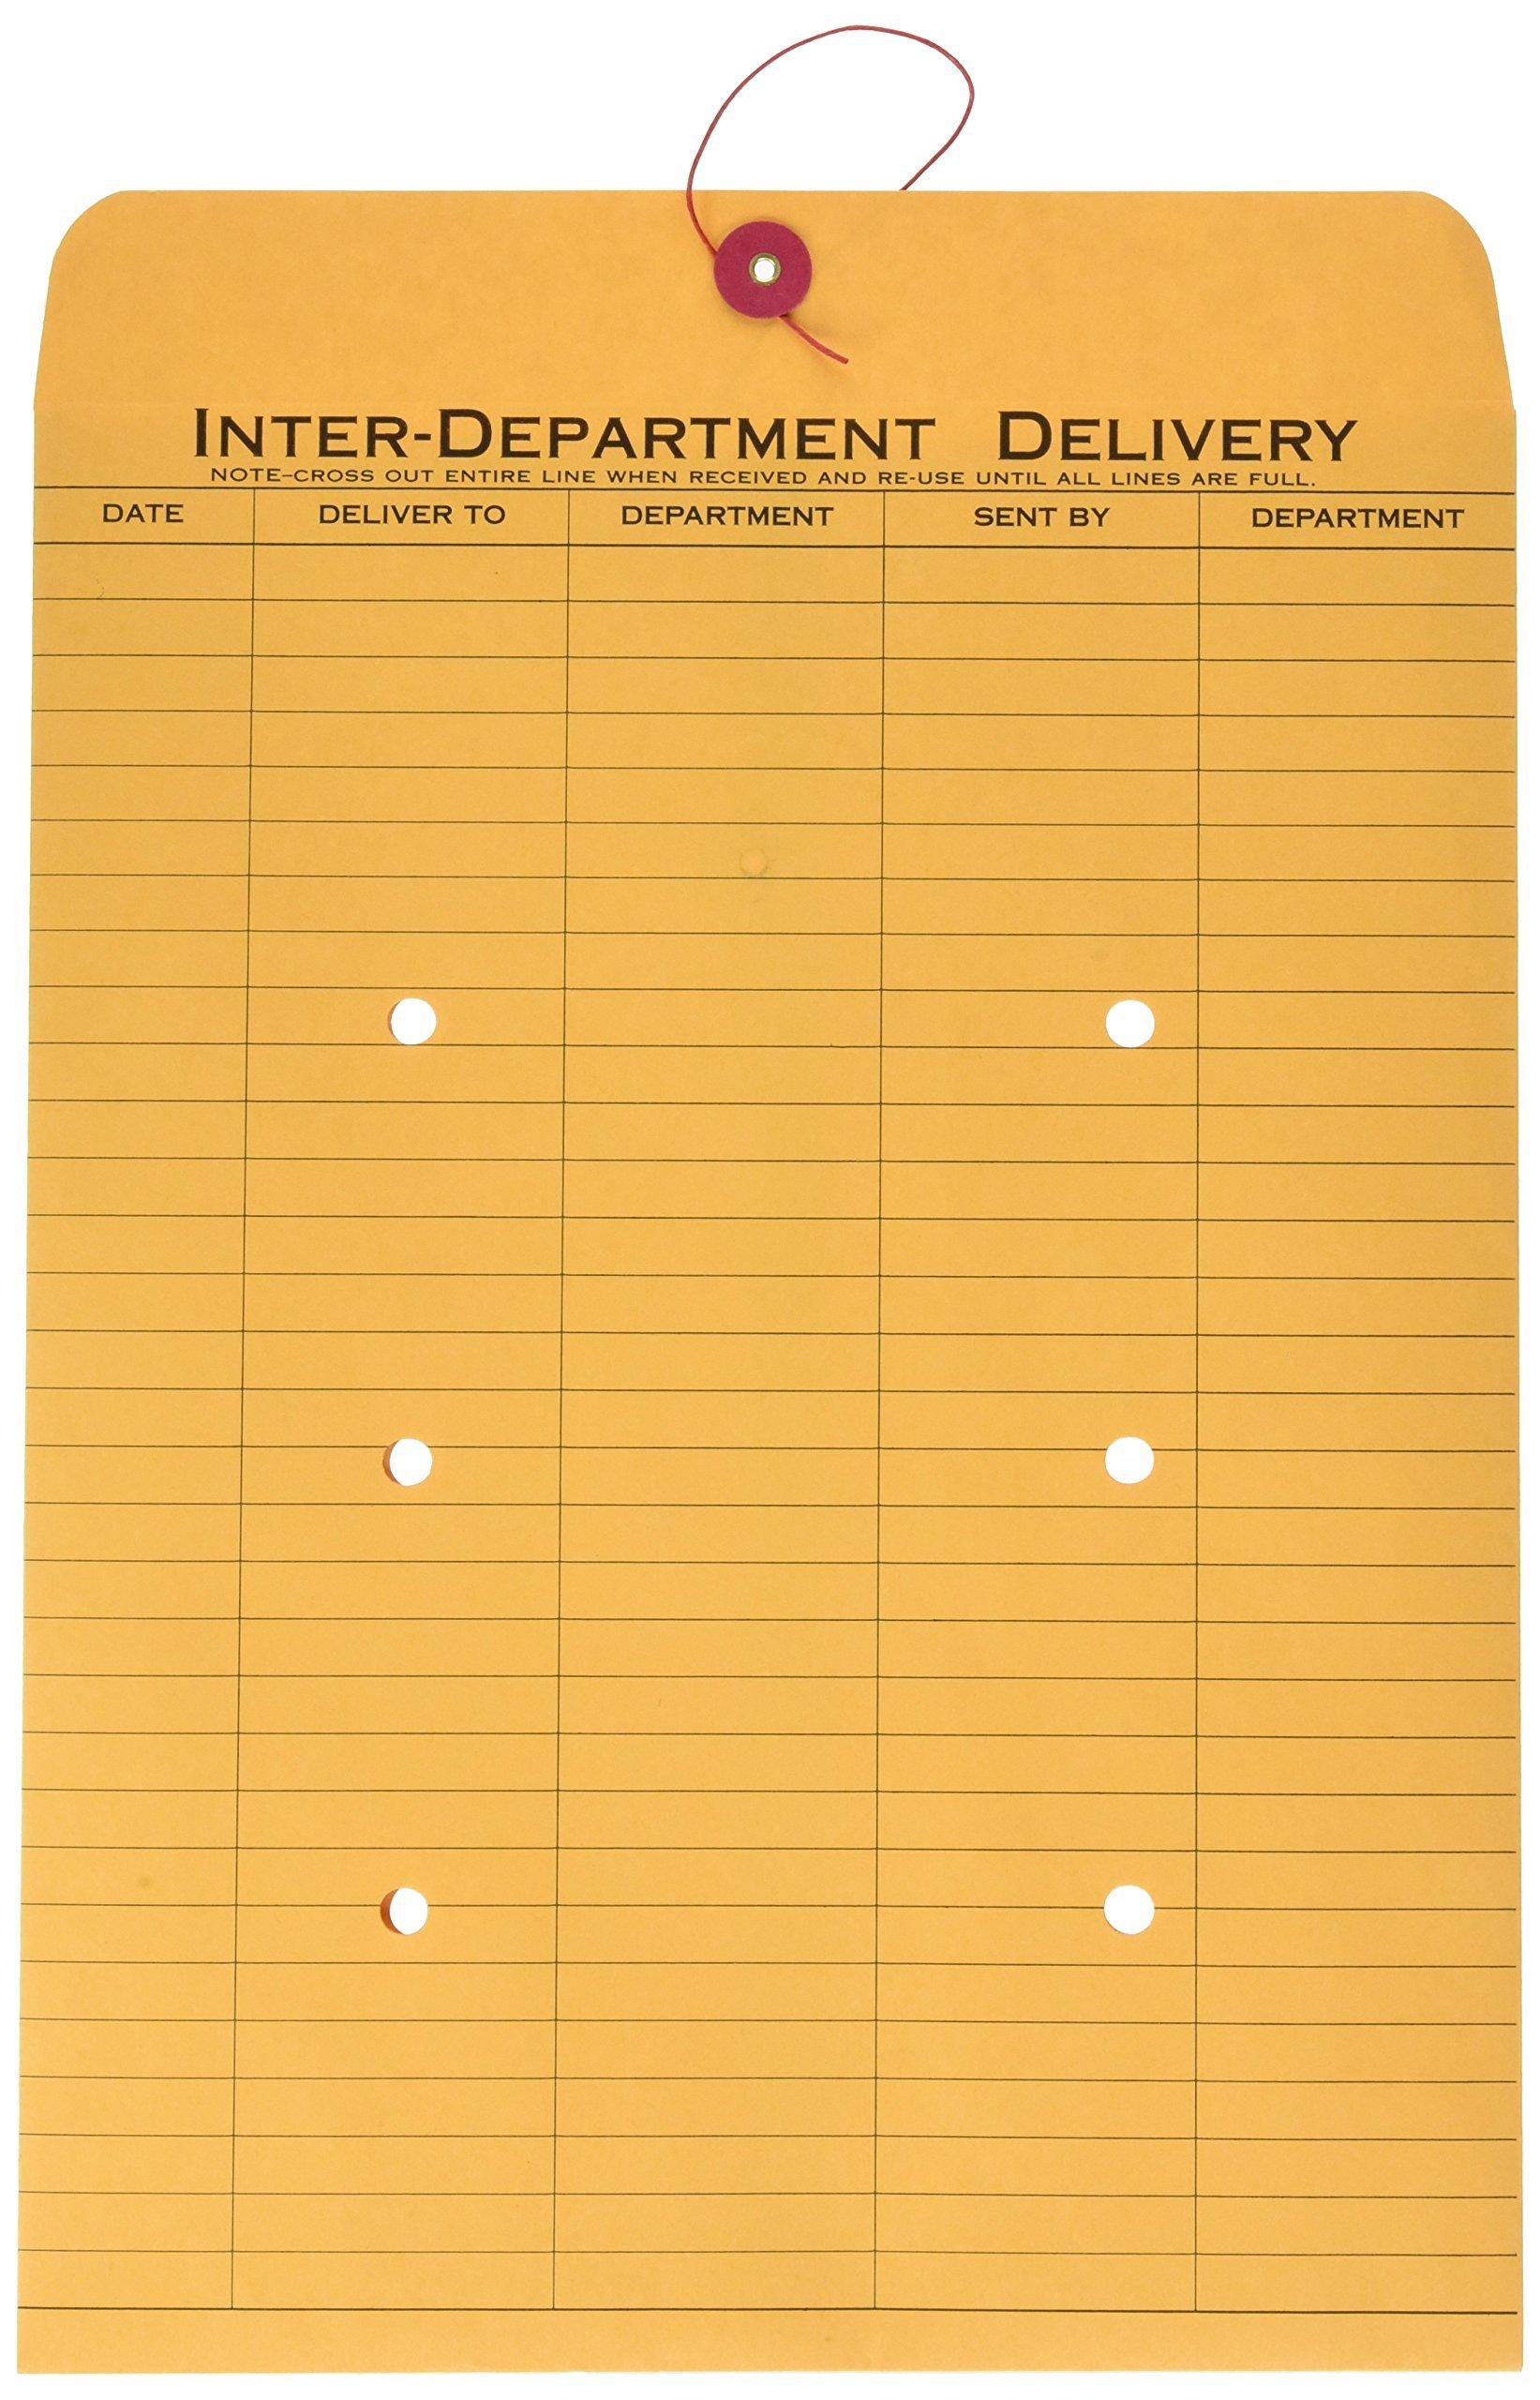 Quality Park 1-Side Print Interoffice Envelopes, String-Tie, Brown Kraft, 10 x 13, 100 per Carton, (63563) by Quality Park